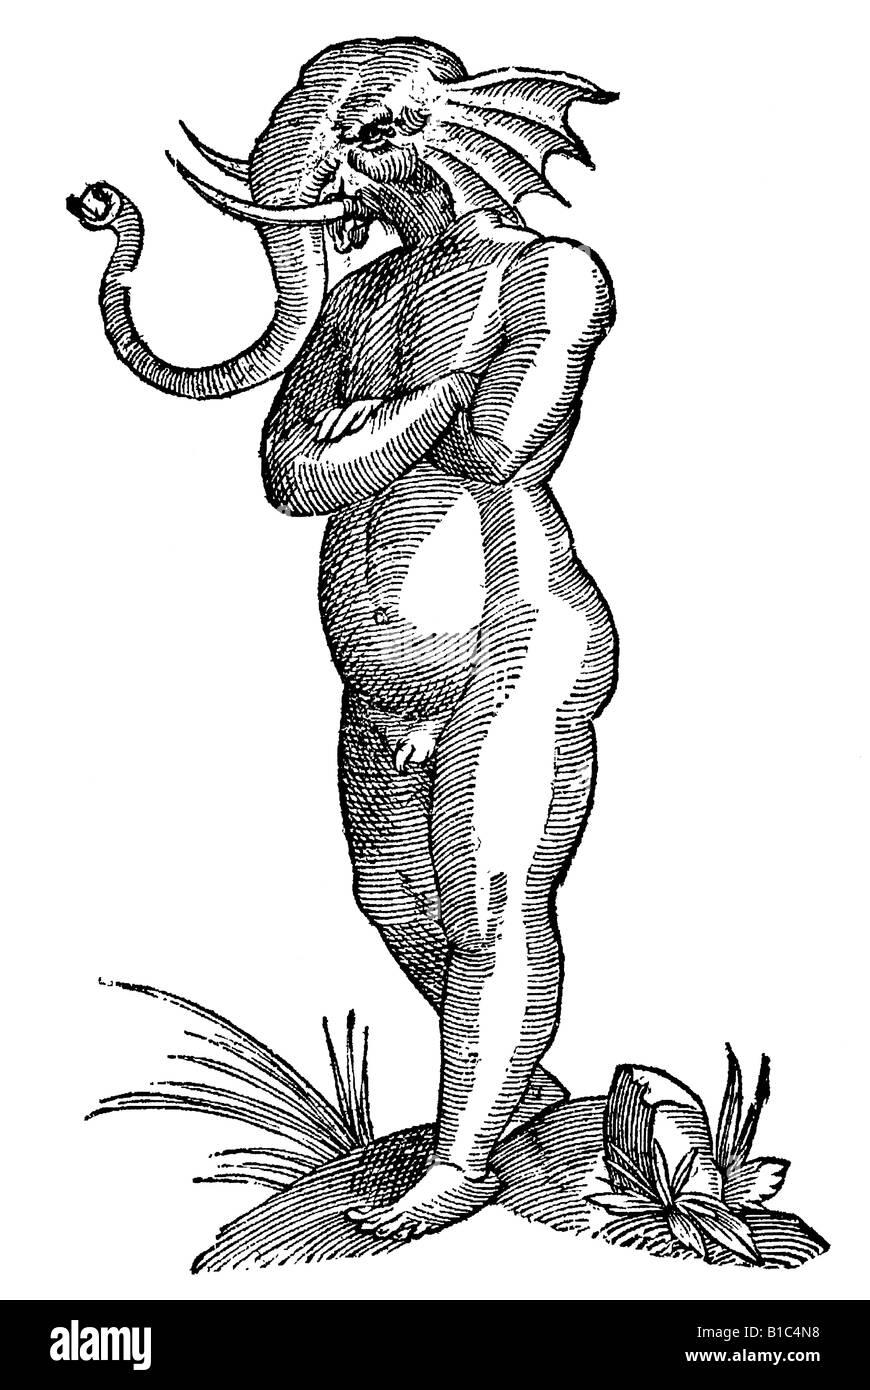 Puer capite elephantino, Aldrovandi, 1642, 17th century, renaissance, Europe - Stock Image